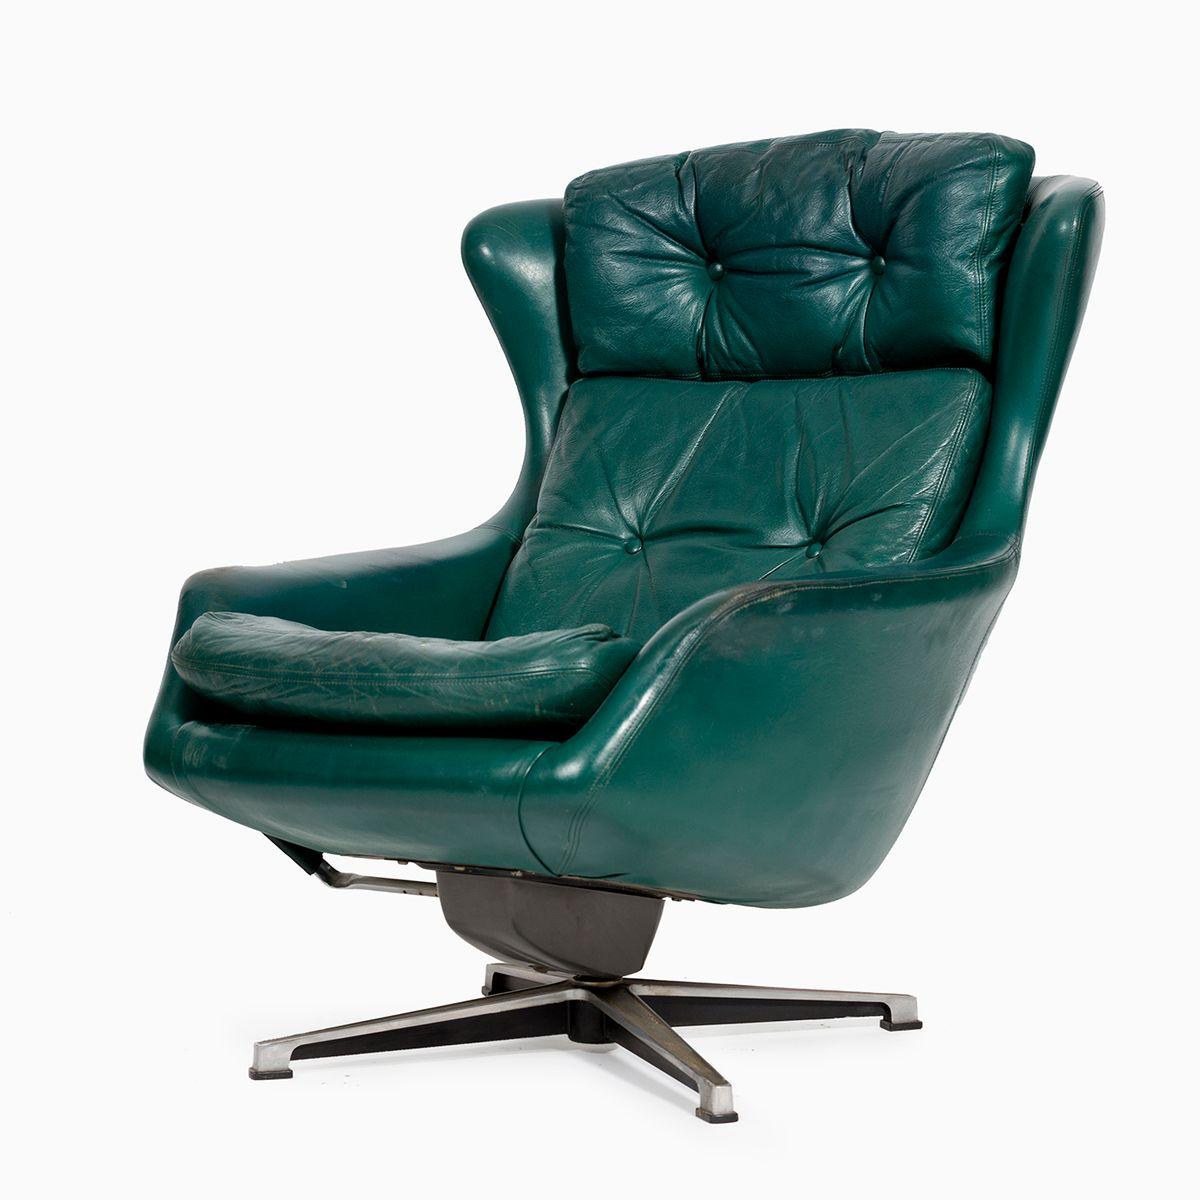 Vintage leather swivel chair - Vintage Dark Green Leather Swivel Armchair From Peem